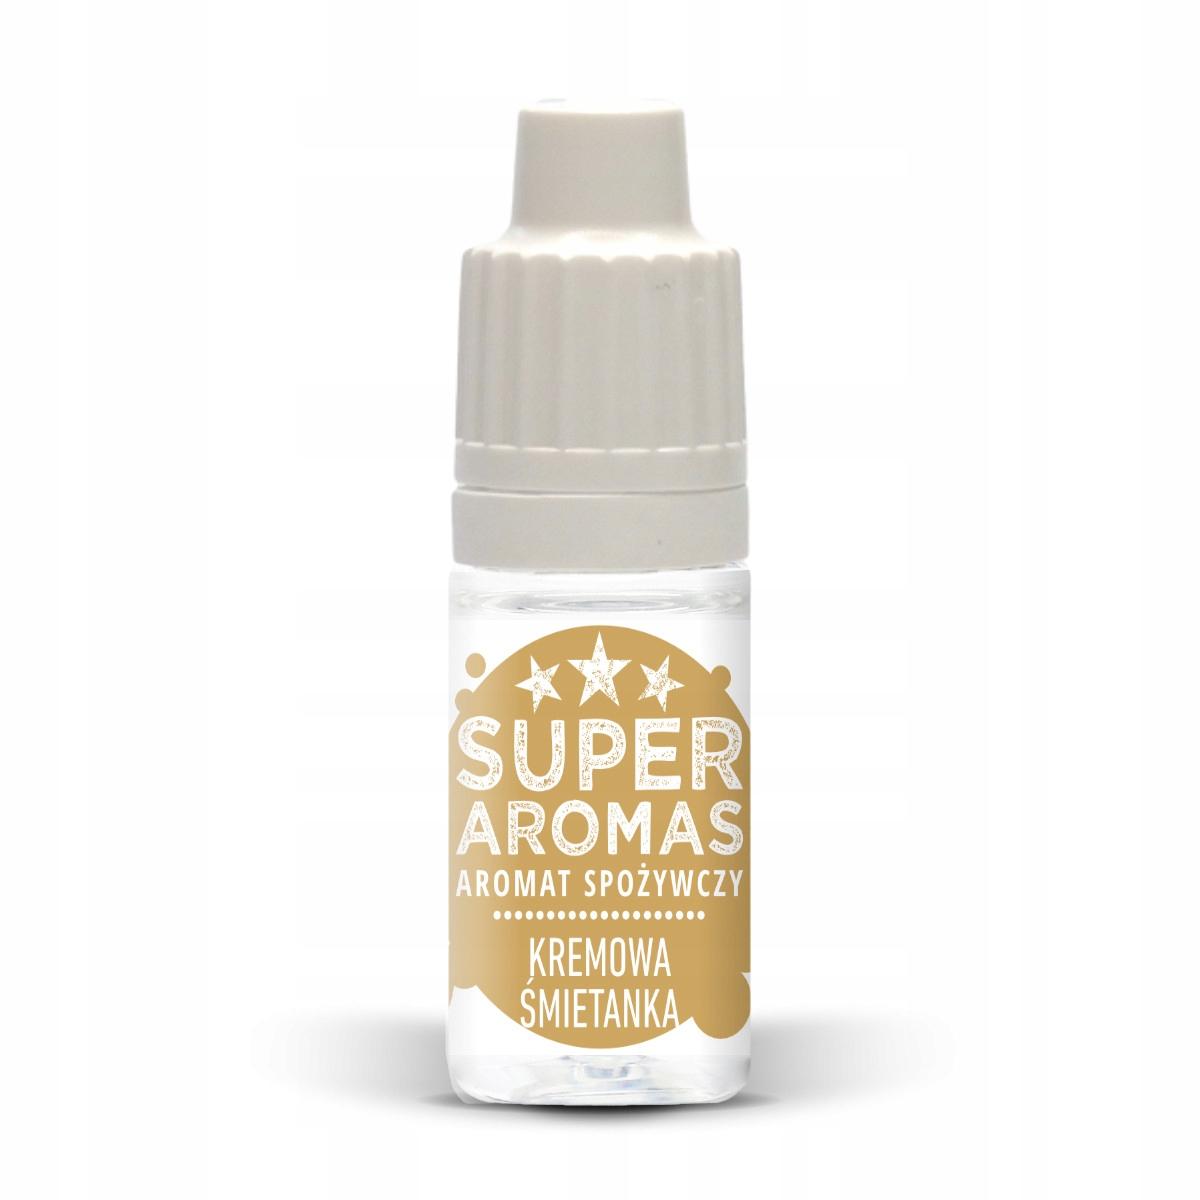 SUPER AROMAS Aromat KREMOWA ŚMIETANKA 10 ml